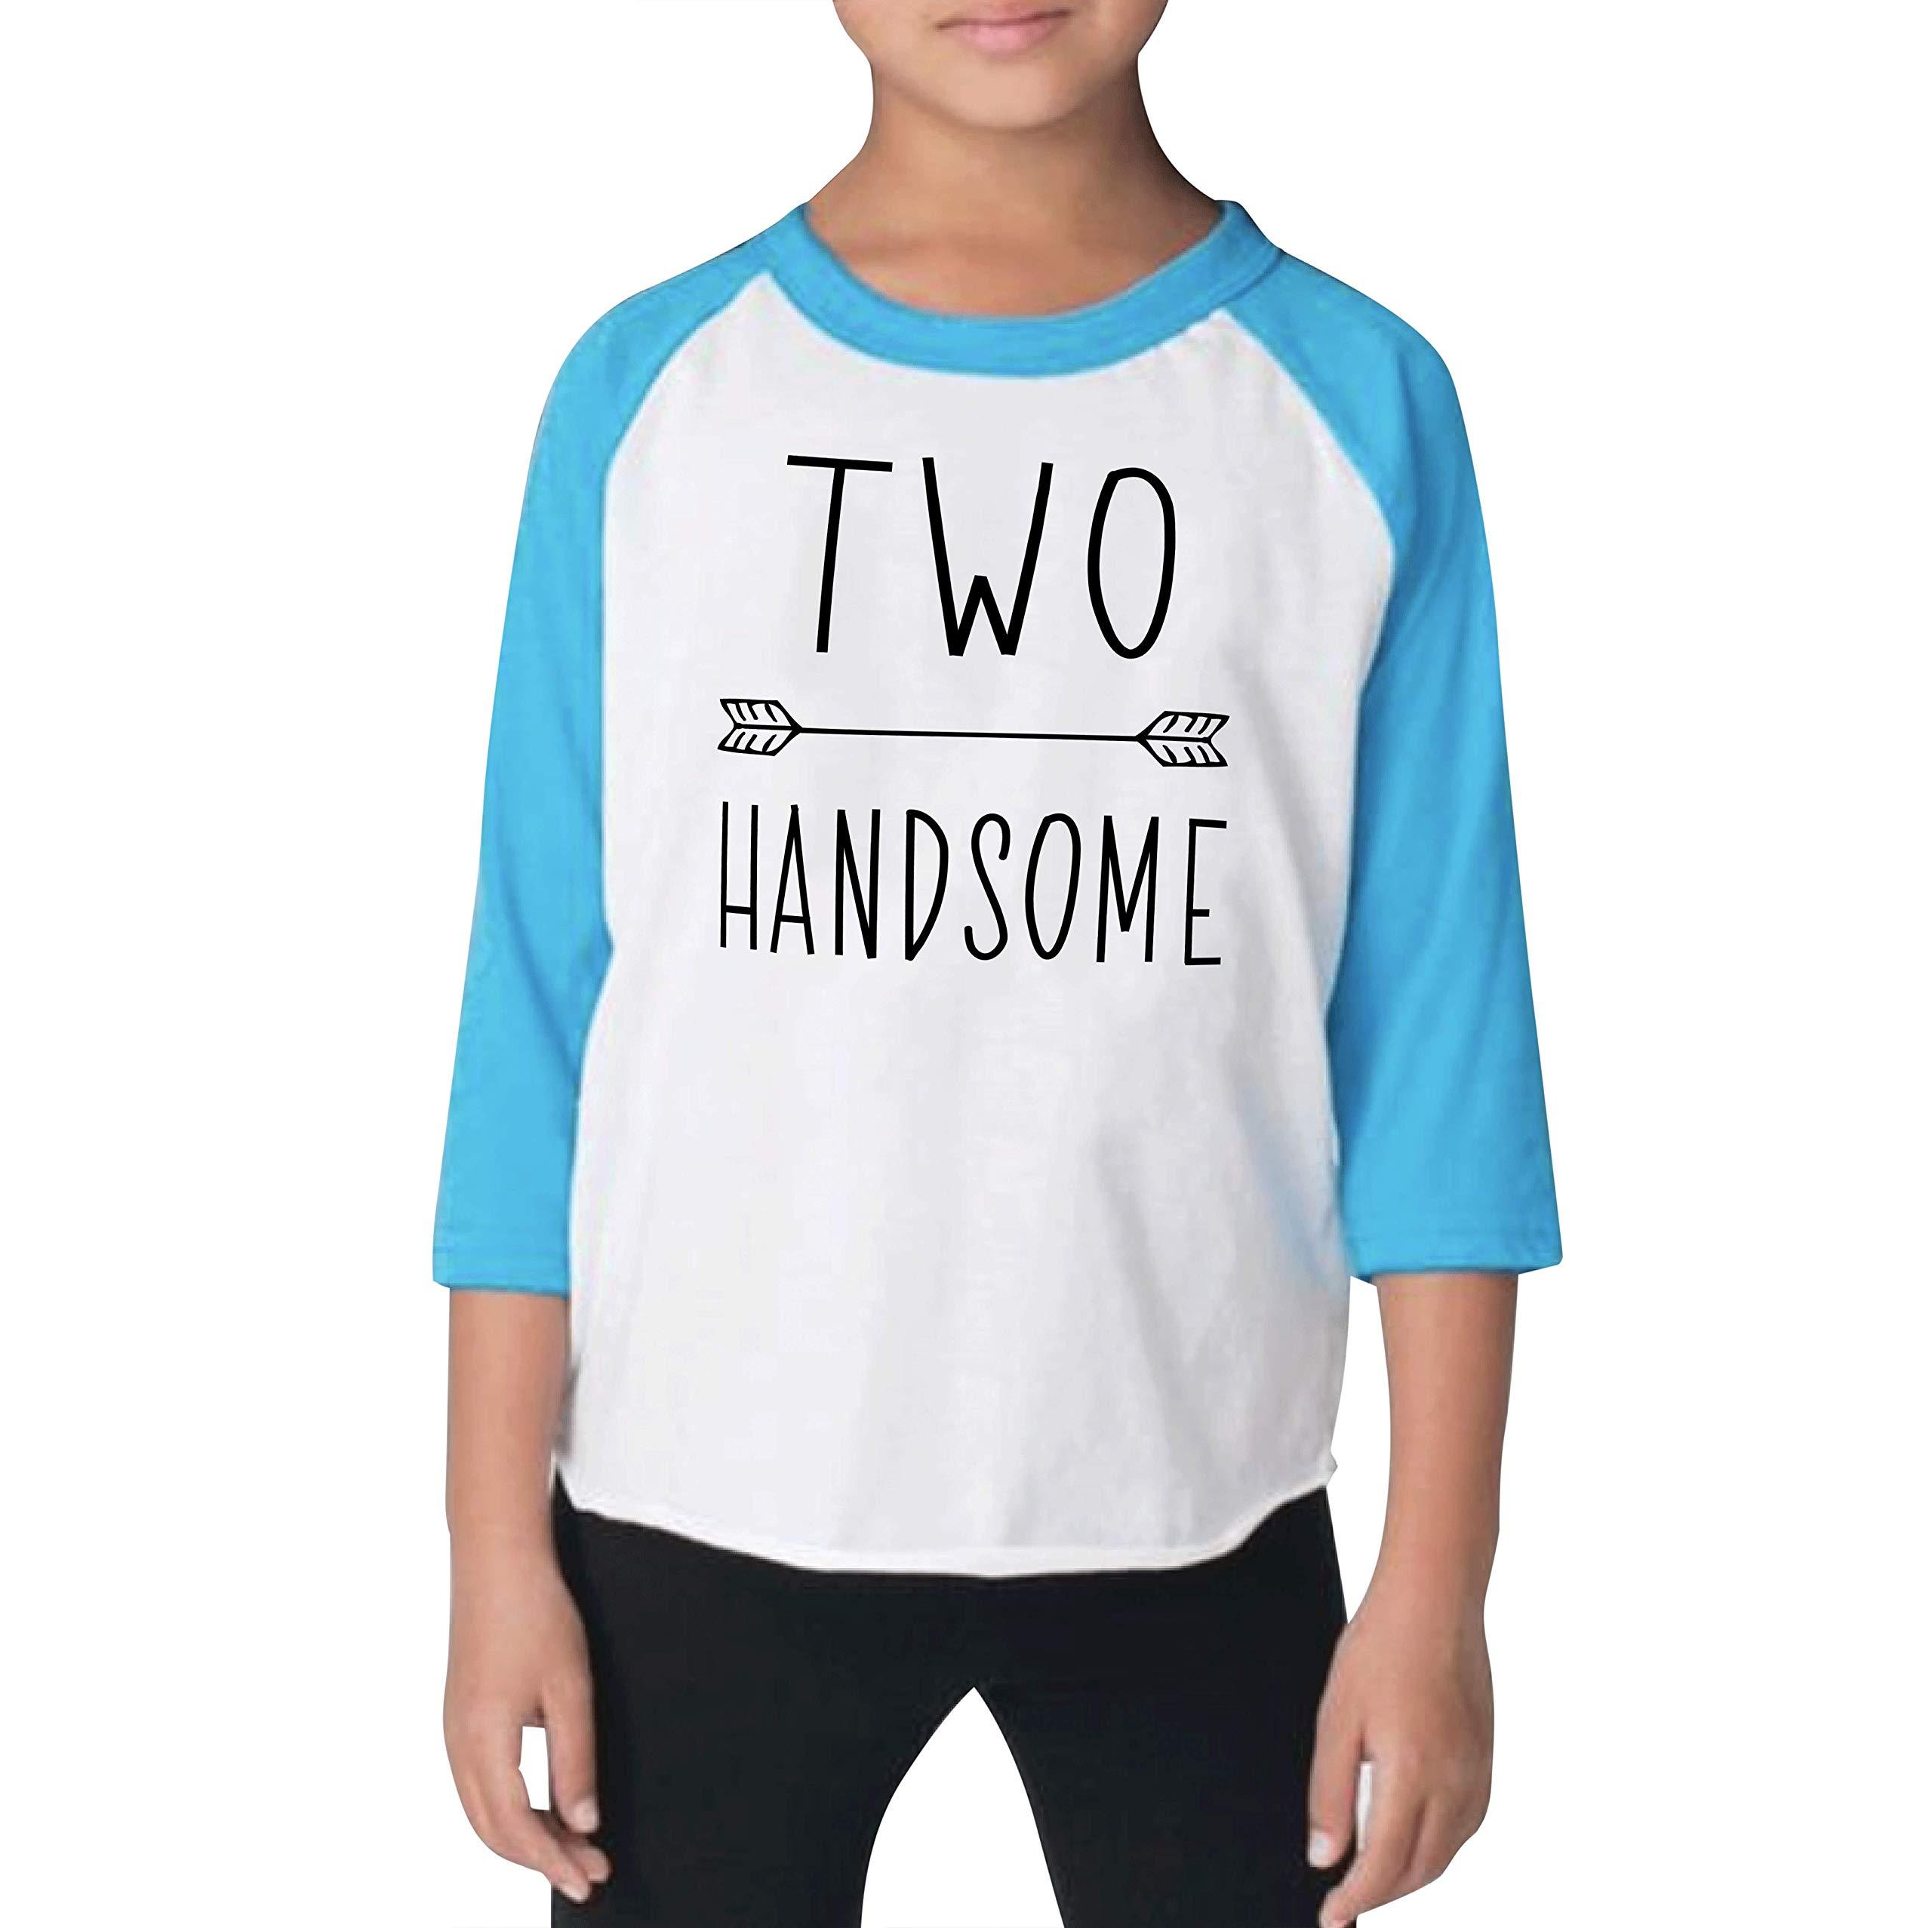 Second Birthday Boy Shirt Two Cool Birthday Shirt 2nd Birthday Boy Shirt 2nd Birthday Shirt Boys Birthday top Birthday shirt